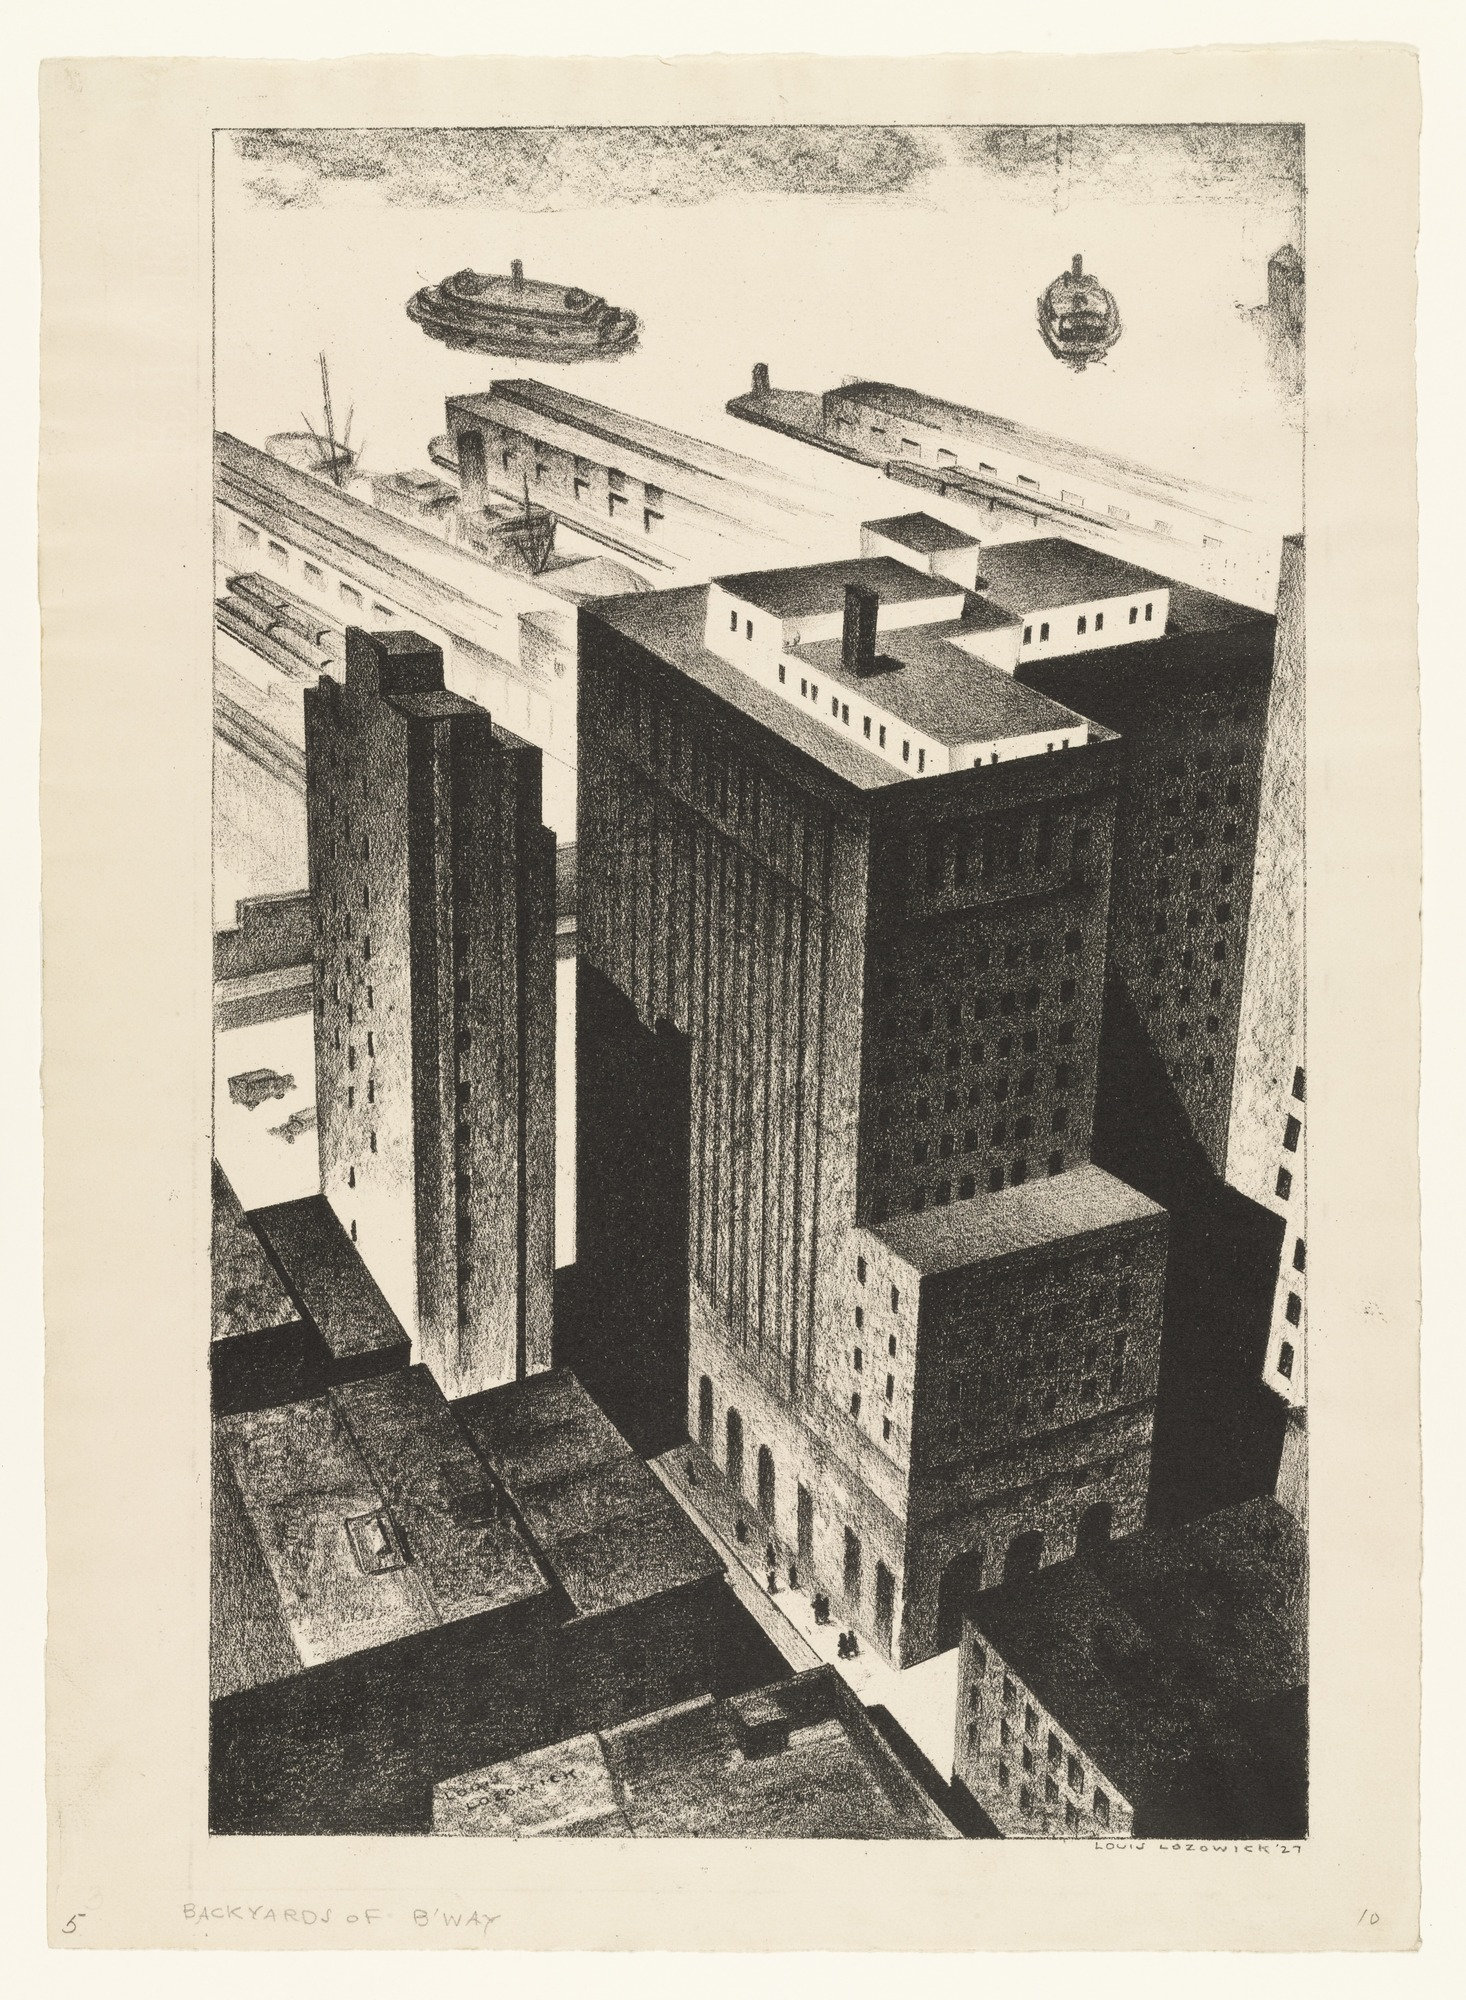 Louis Lozowick Backyards of Broadway 1926, dated 1927